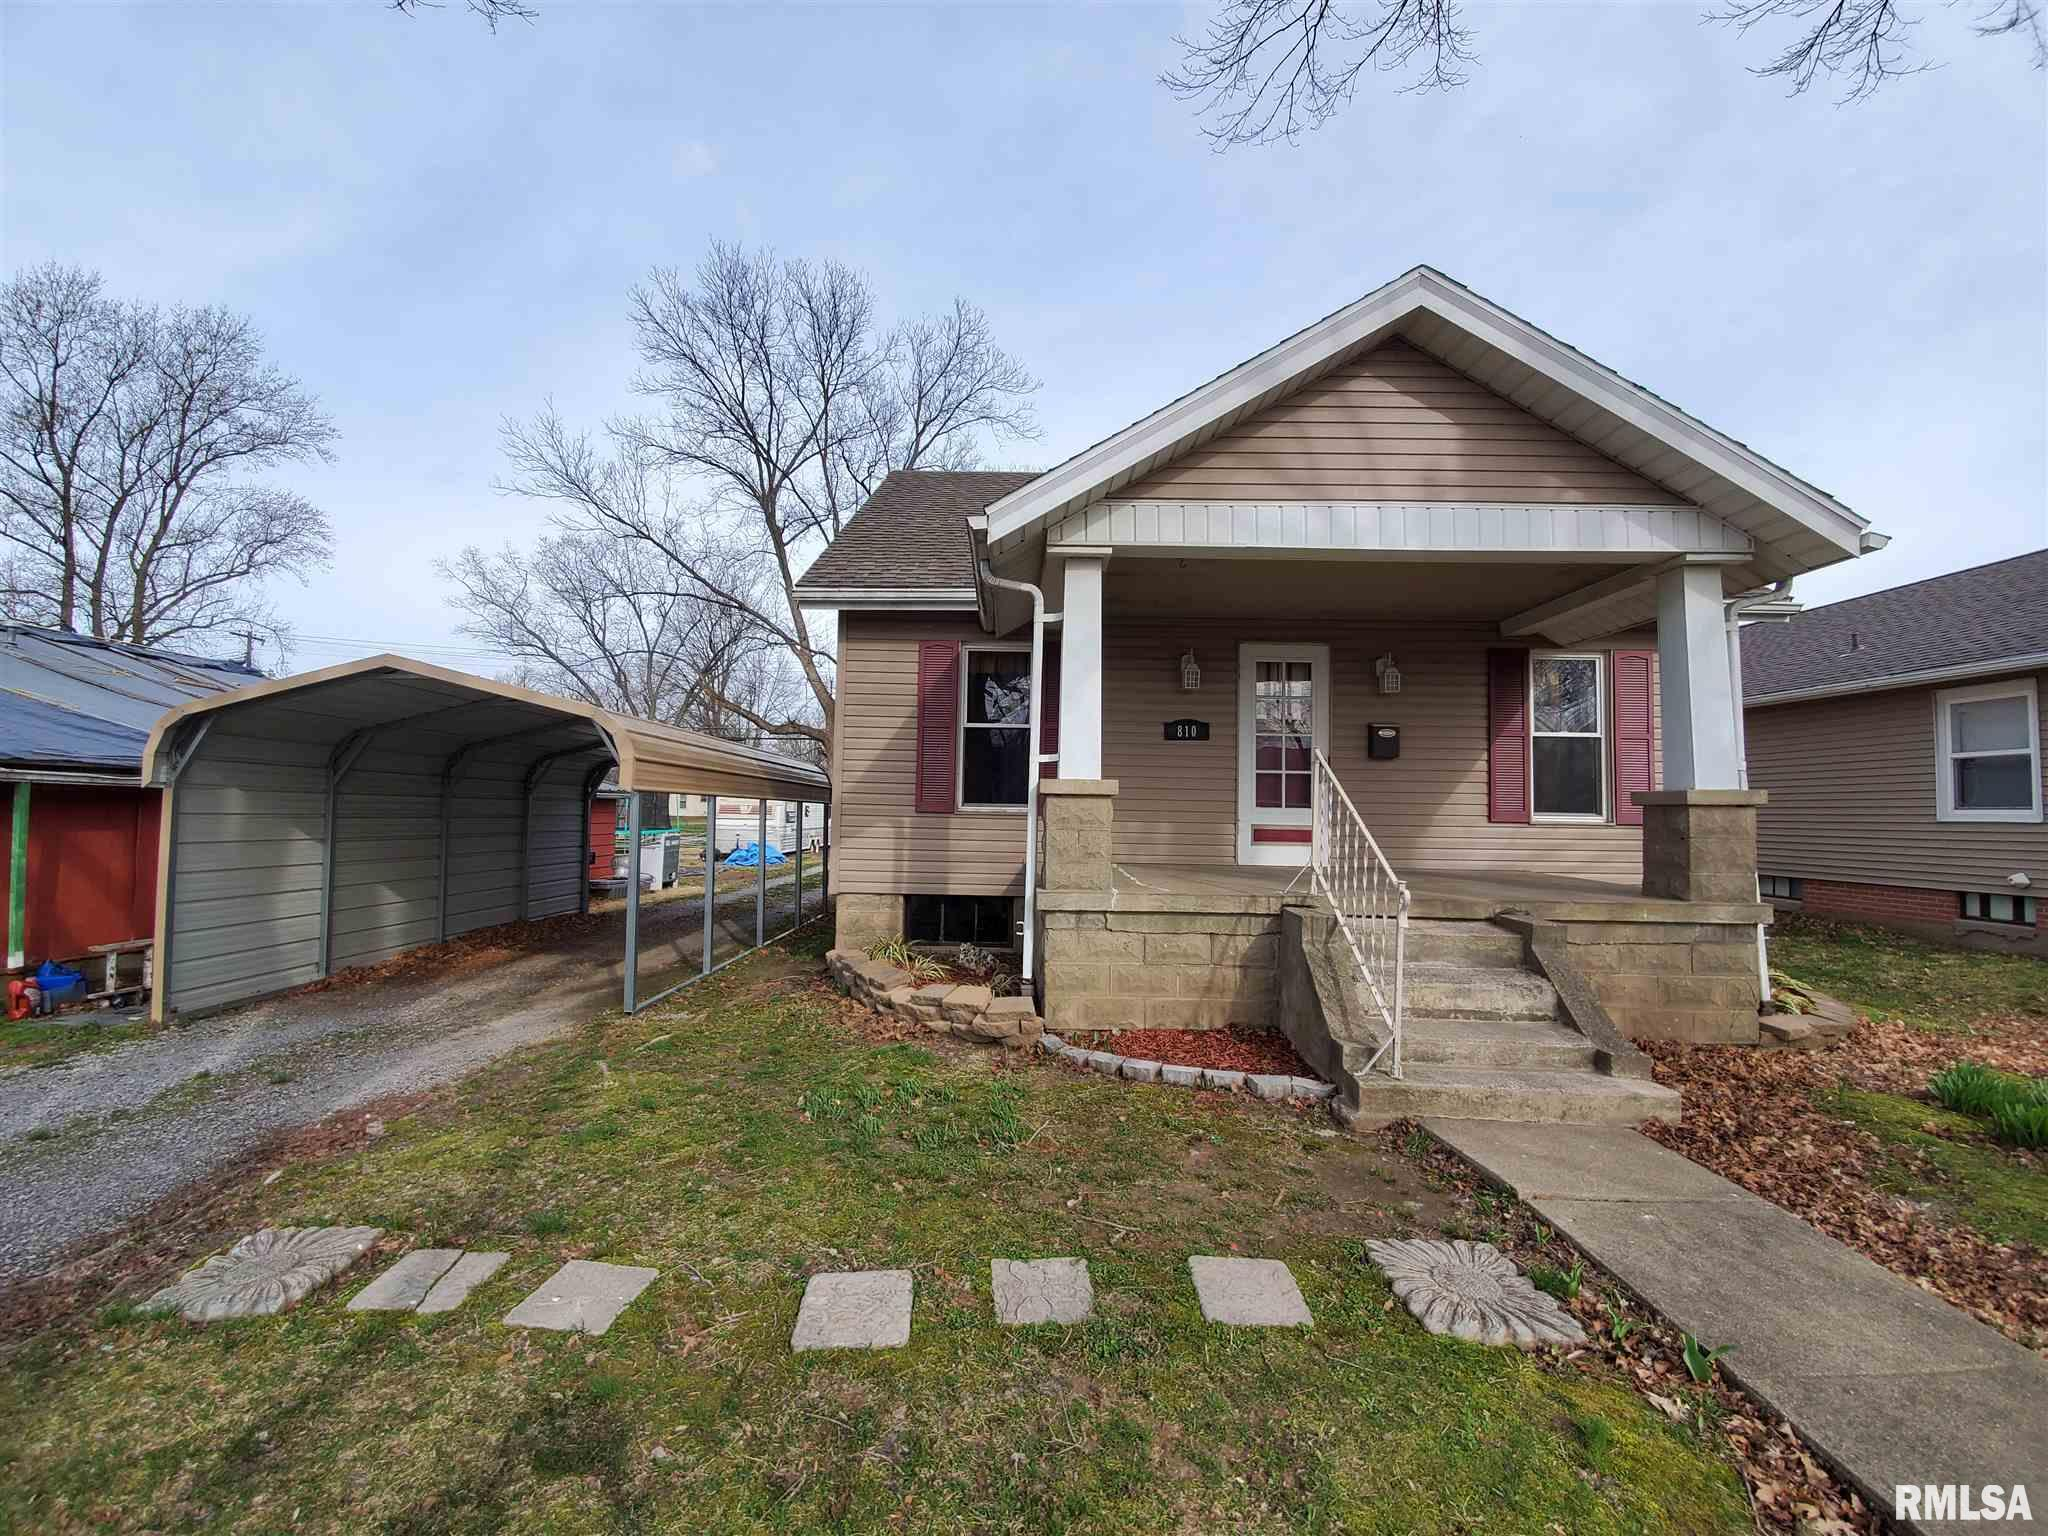 810 OAK Property Photo - Carmi, IL real estate listing